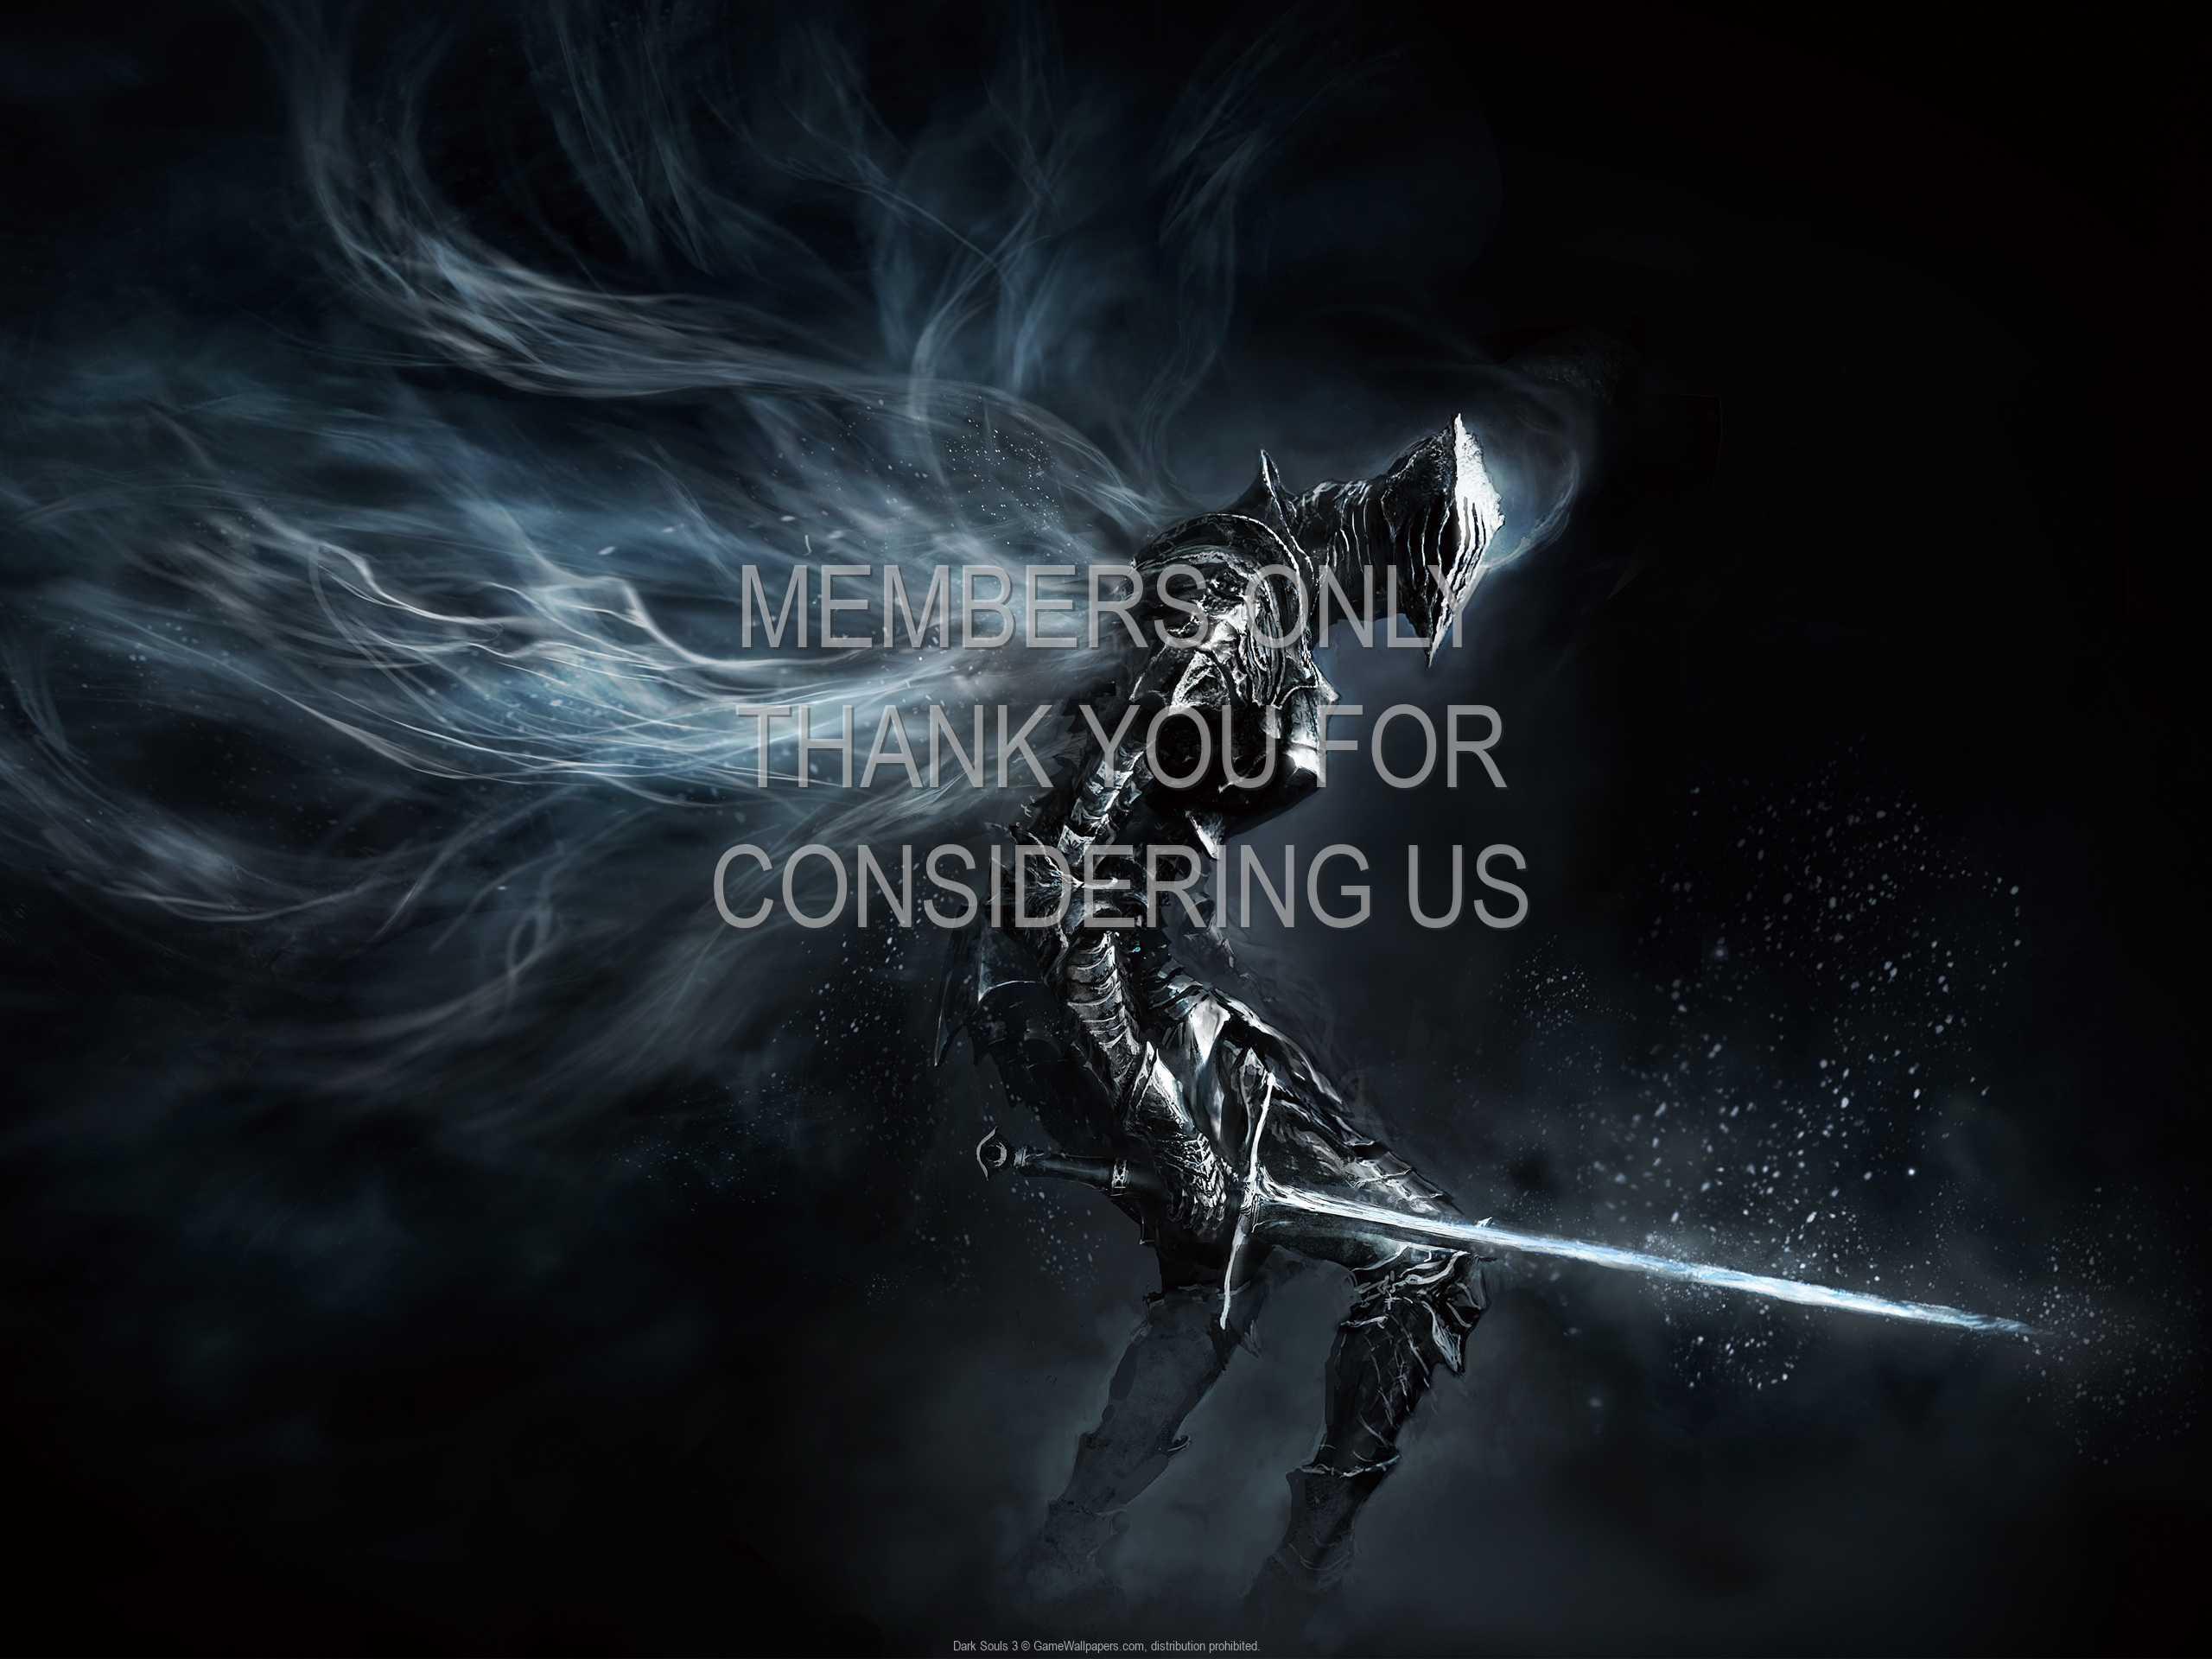 Dark Souls 3 1080p Horizontal Handy Hintergrundbild 05